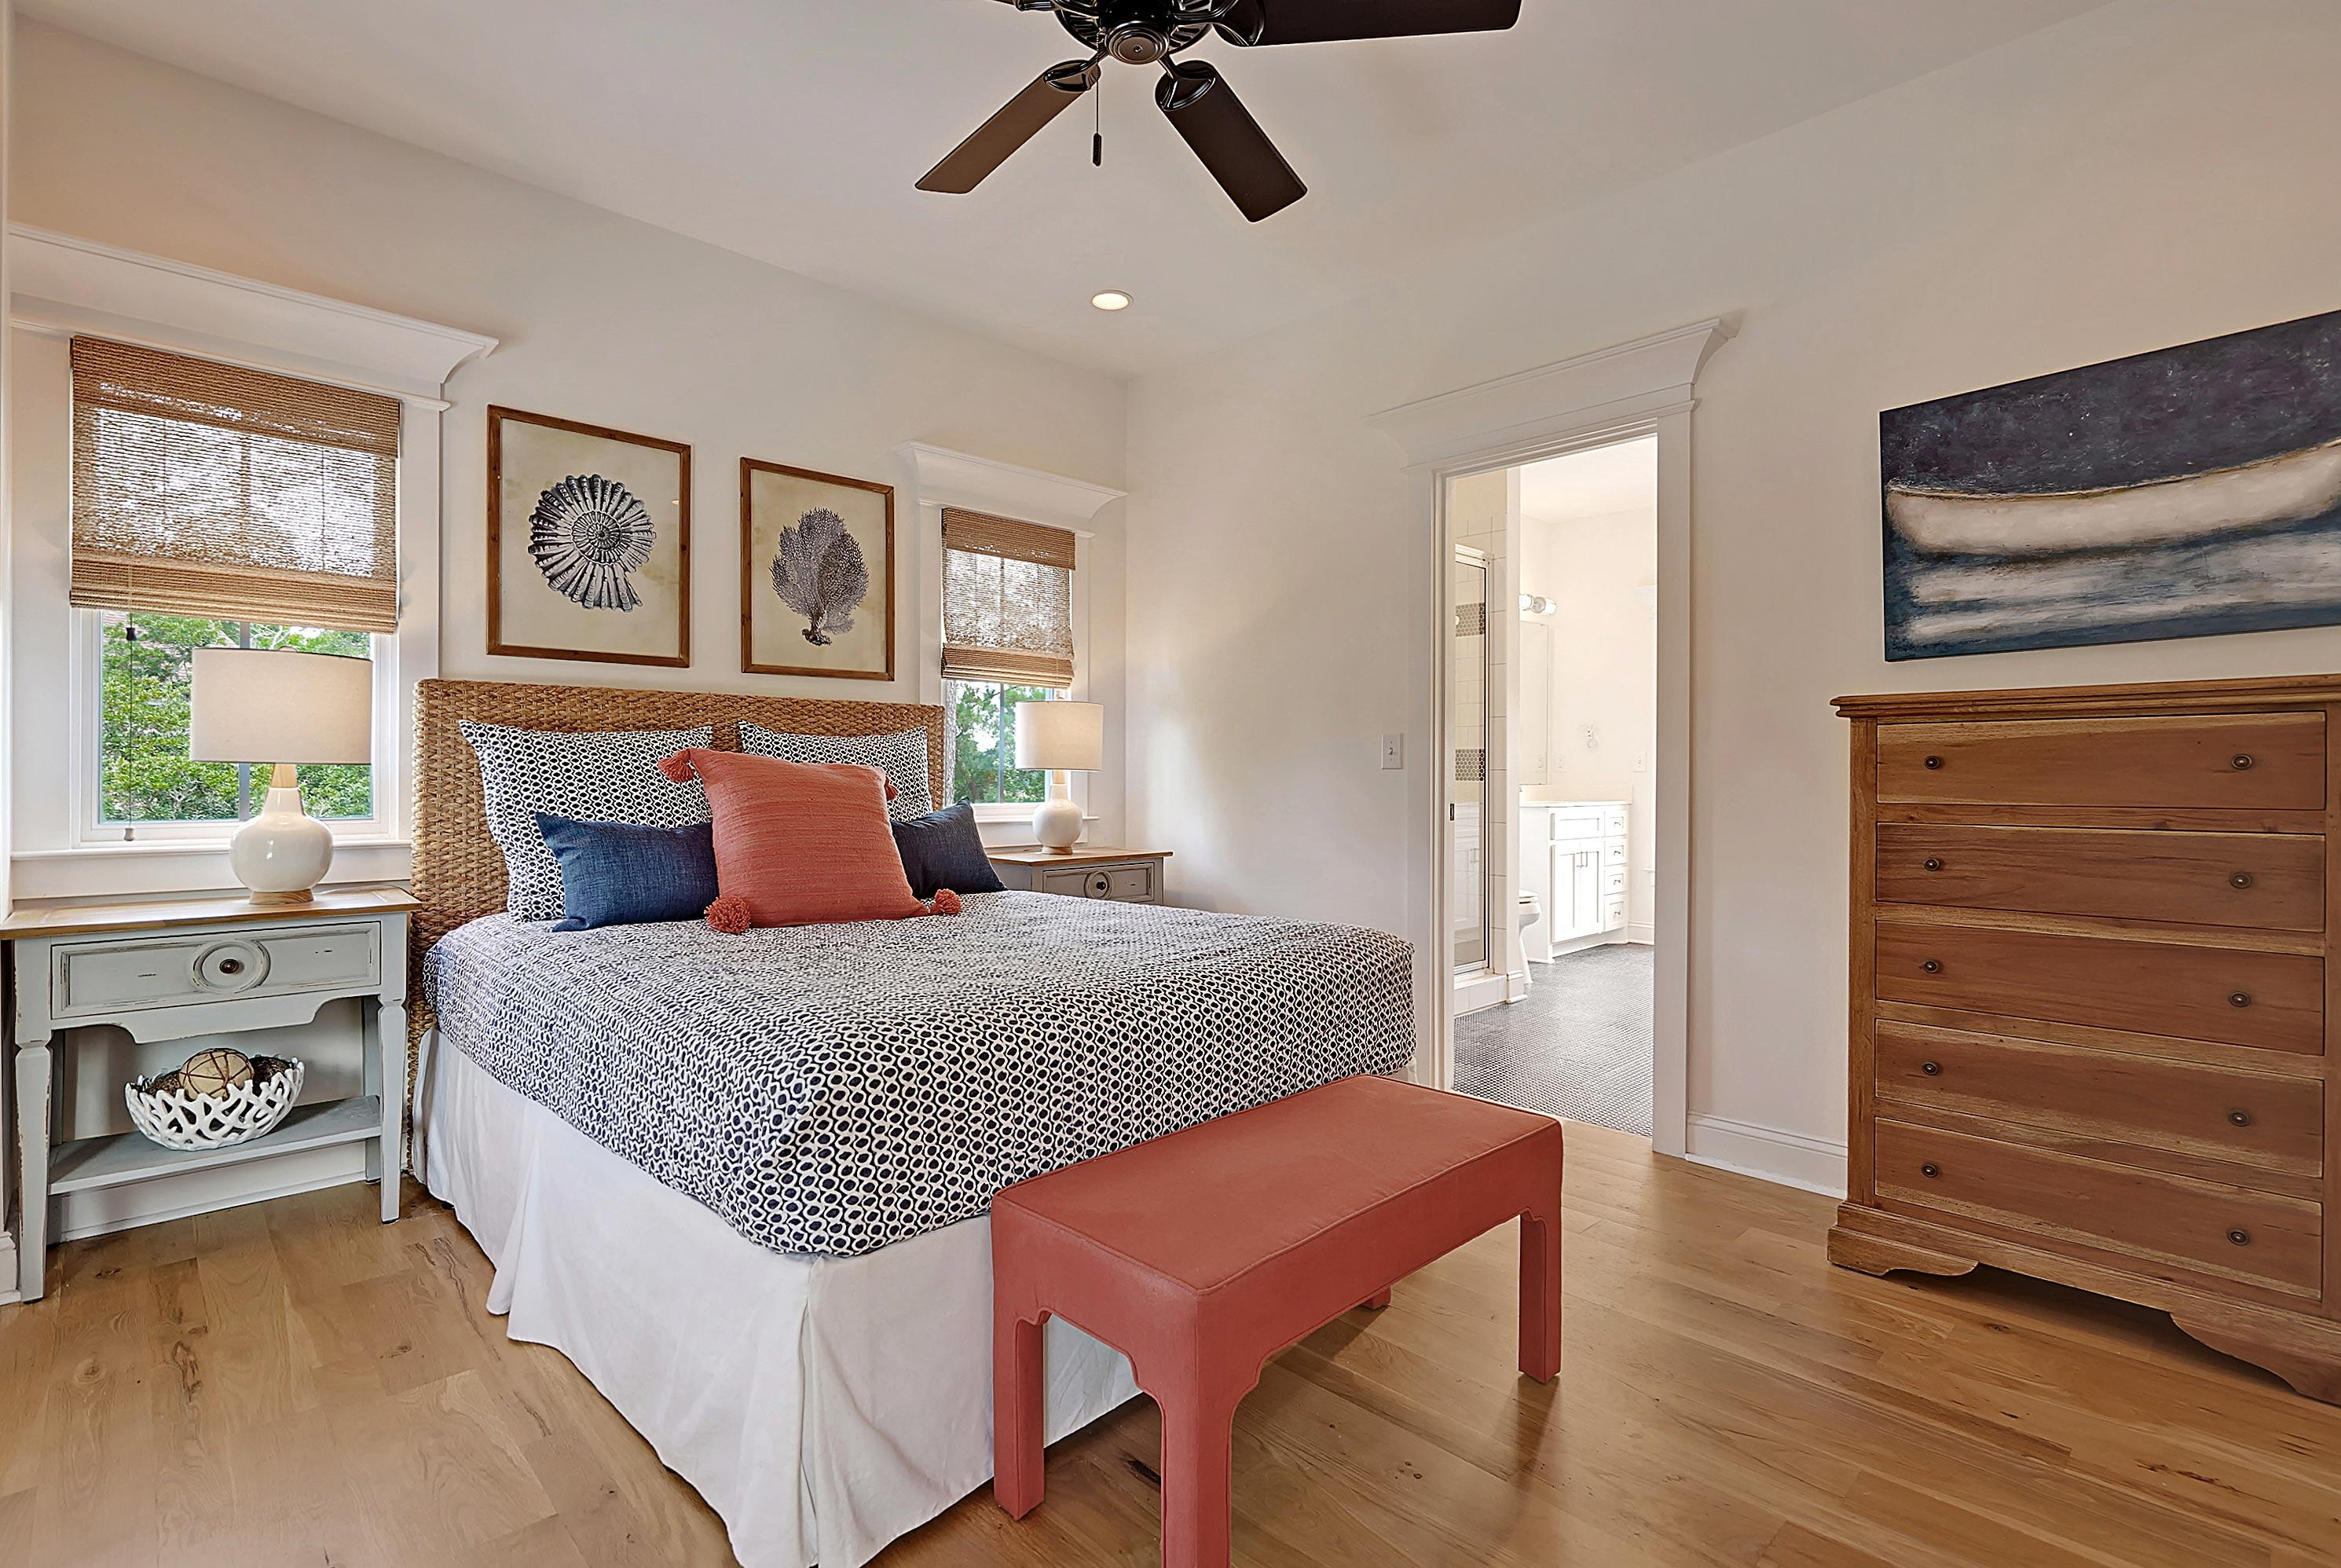 Grassy Creek Homes For Sale - 294 River Oak, Mount Pleasant, SC - 16